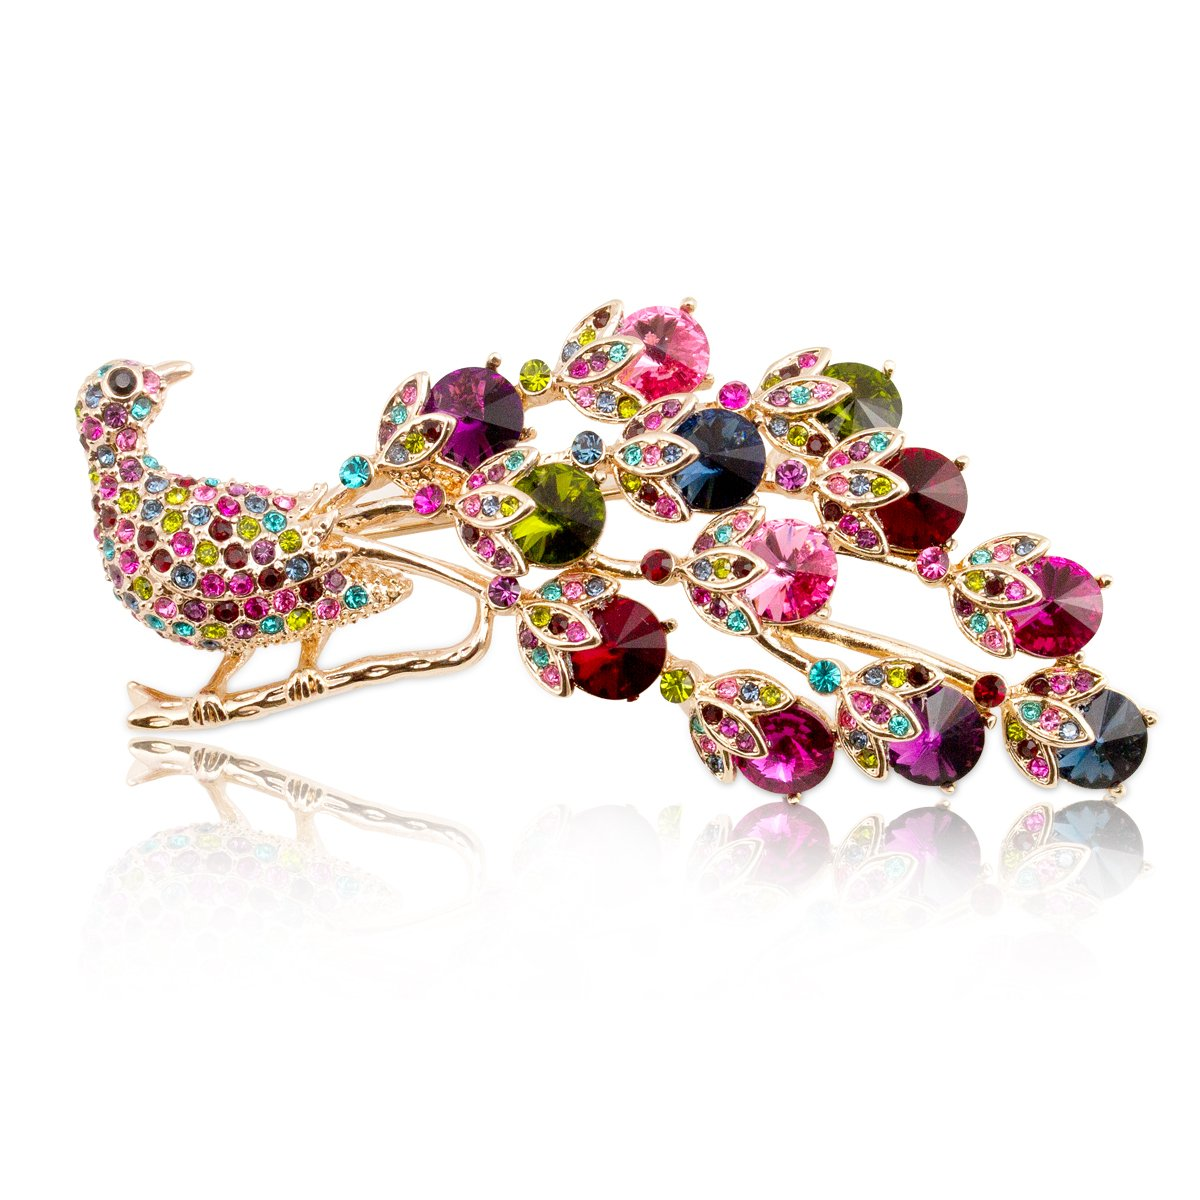 Fashion Plaza Vintage Style Peacock Brooch Pin Multi Color Crystals BR114